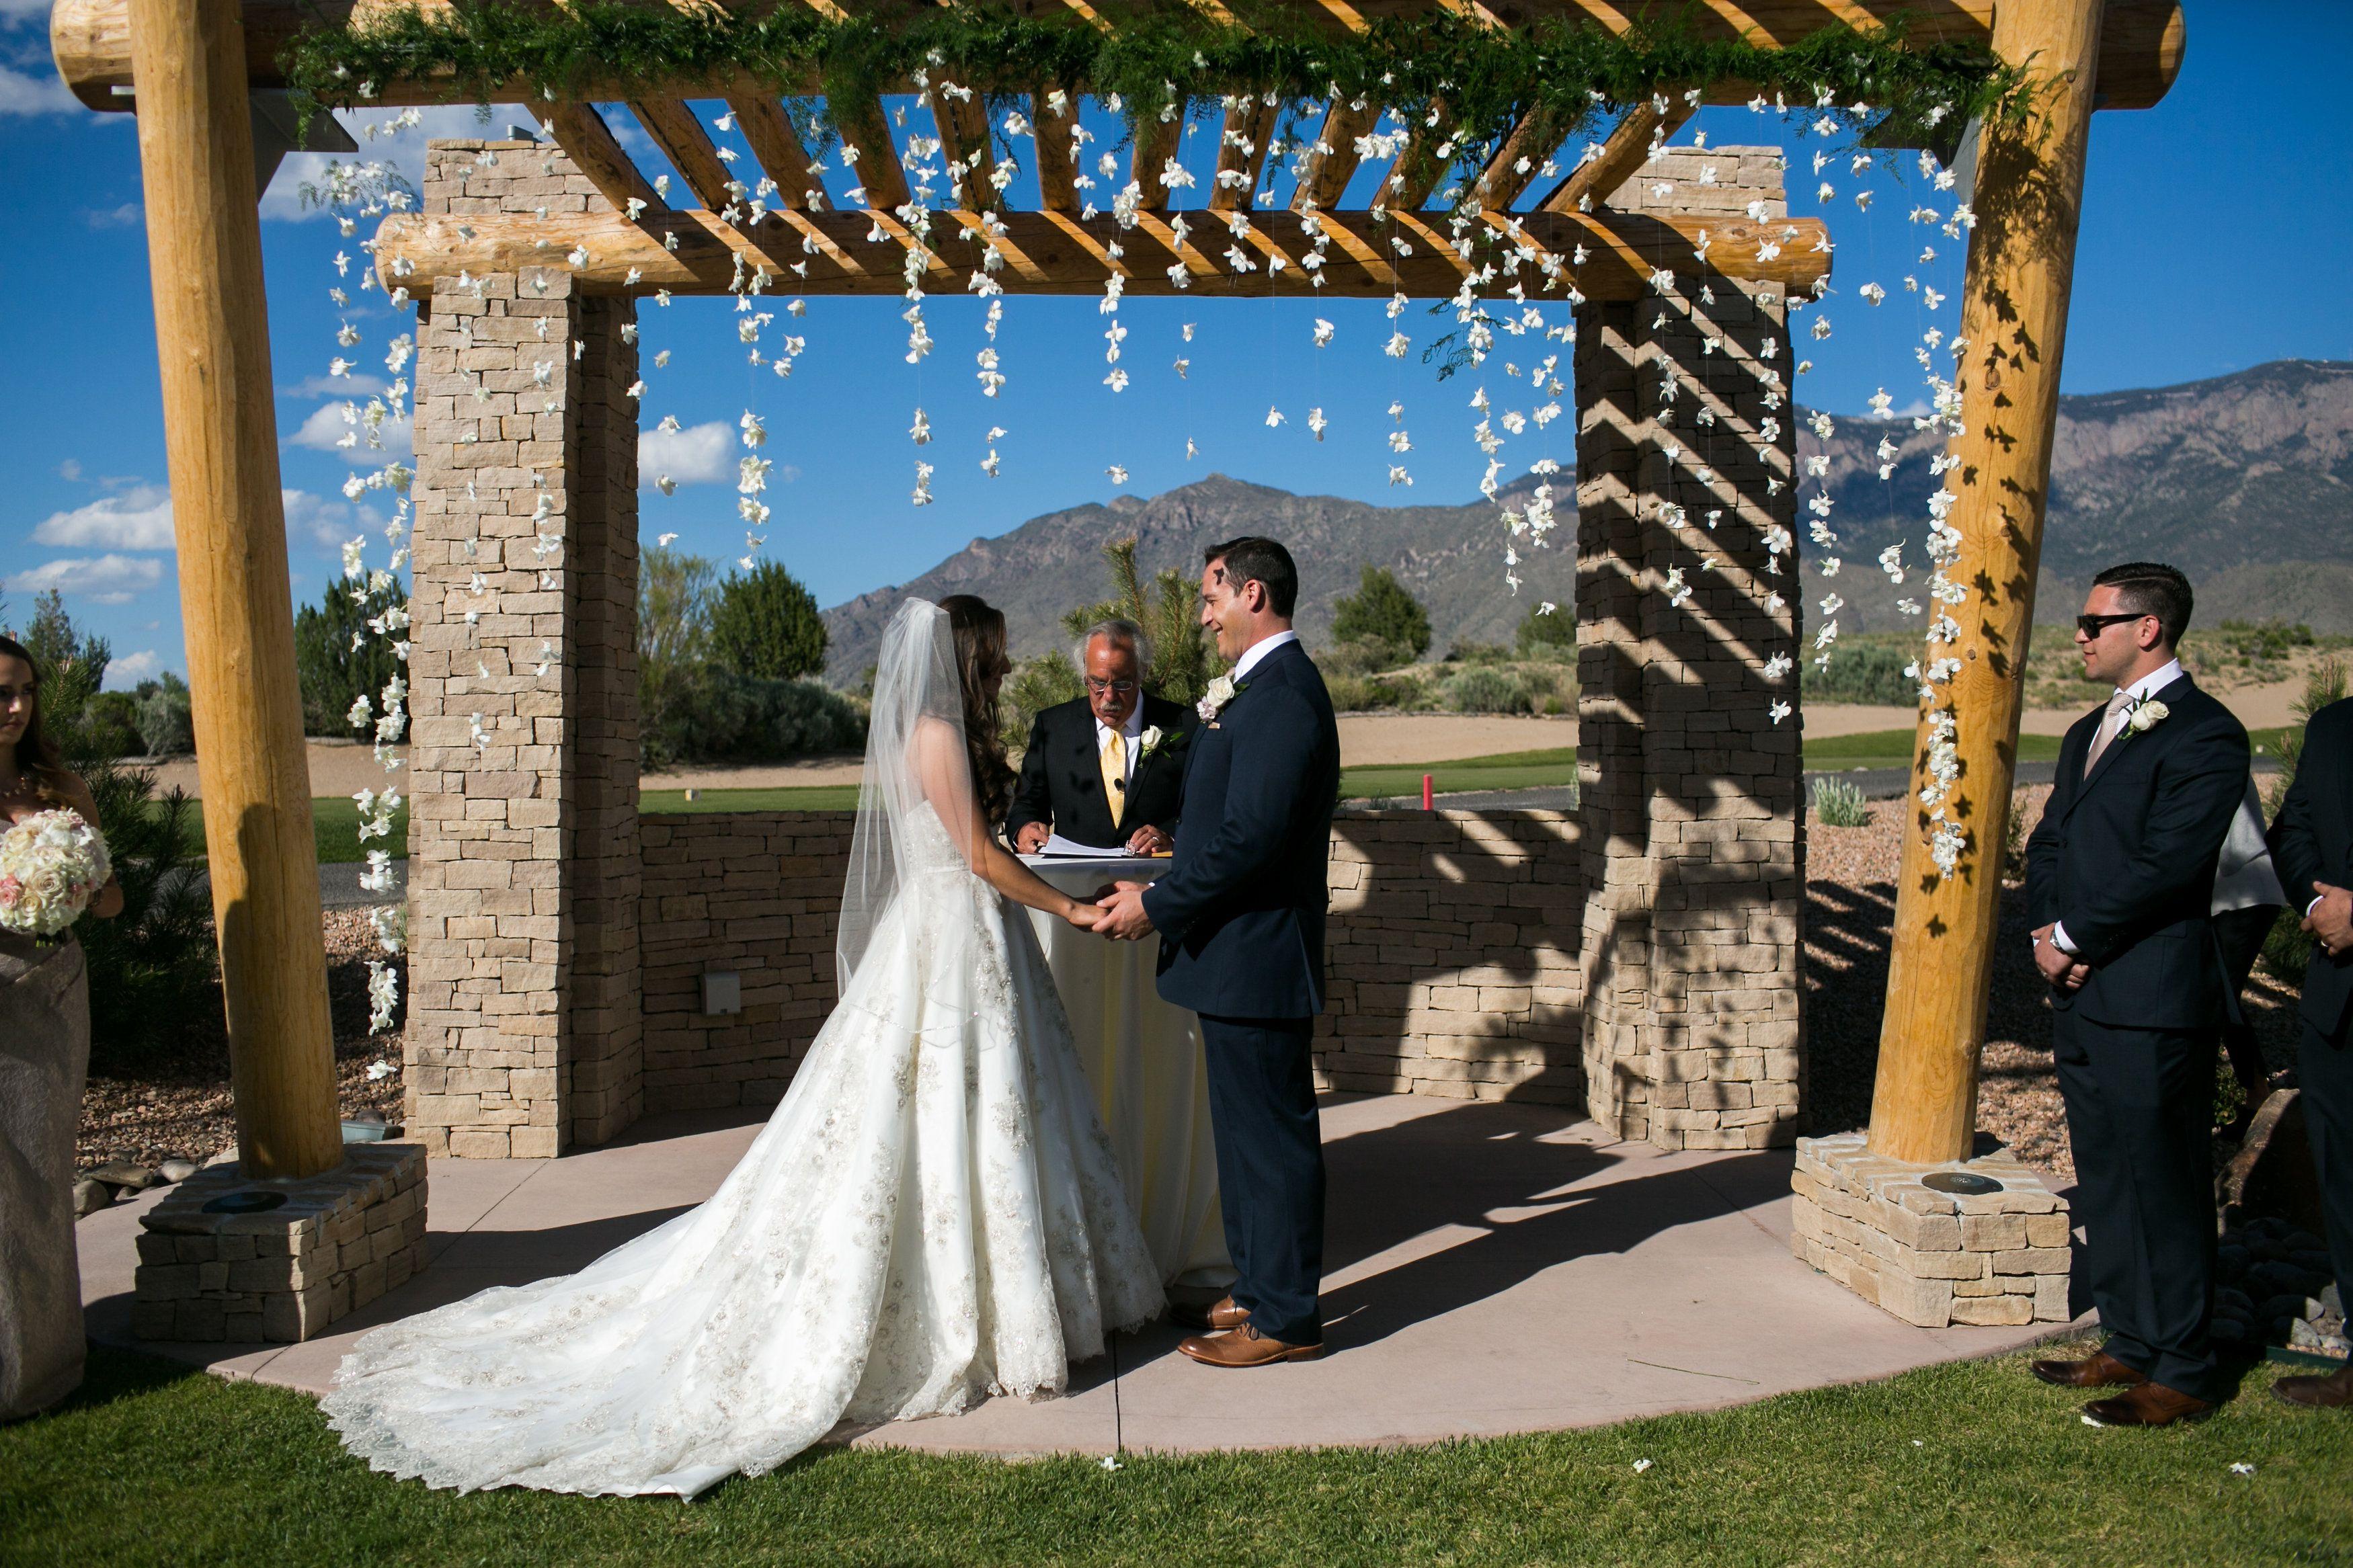 Outdoor Wedding Ceremony Held In Albuquerque Nm At The Event Center Sandia Golf Club